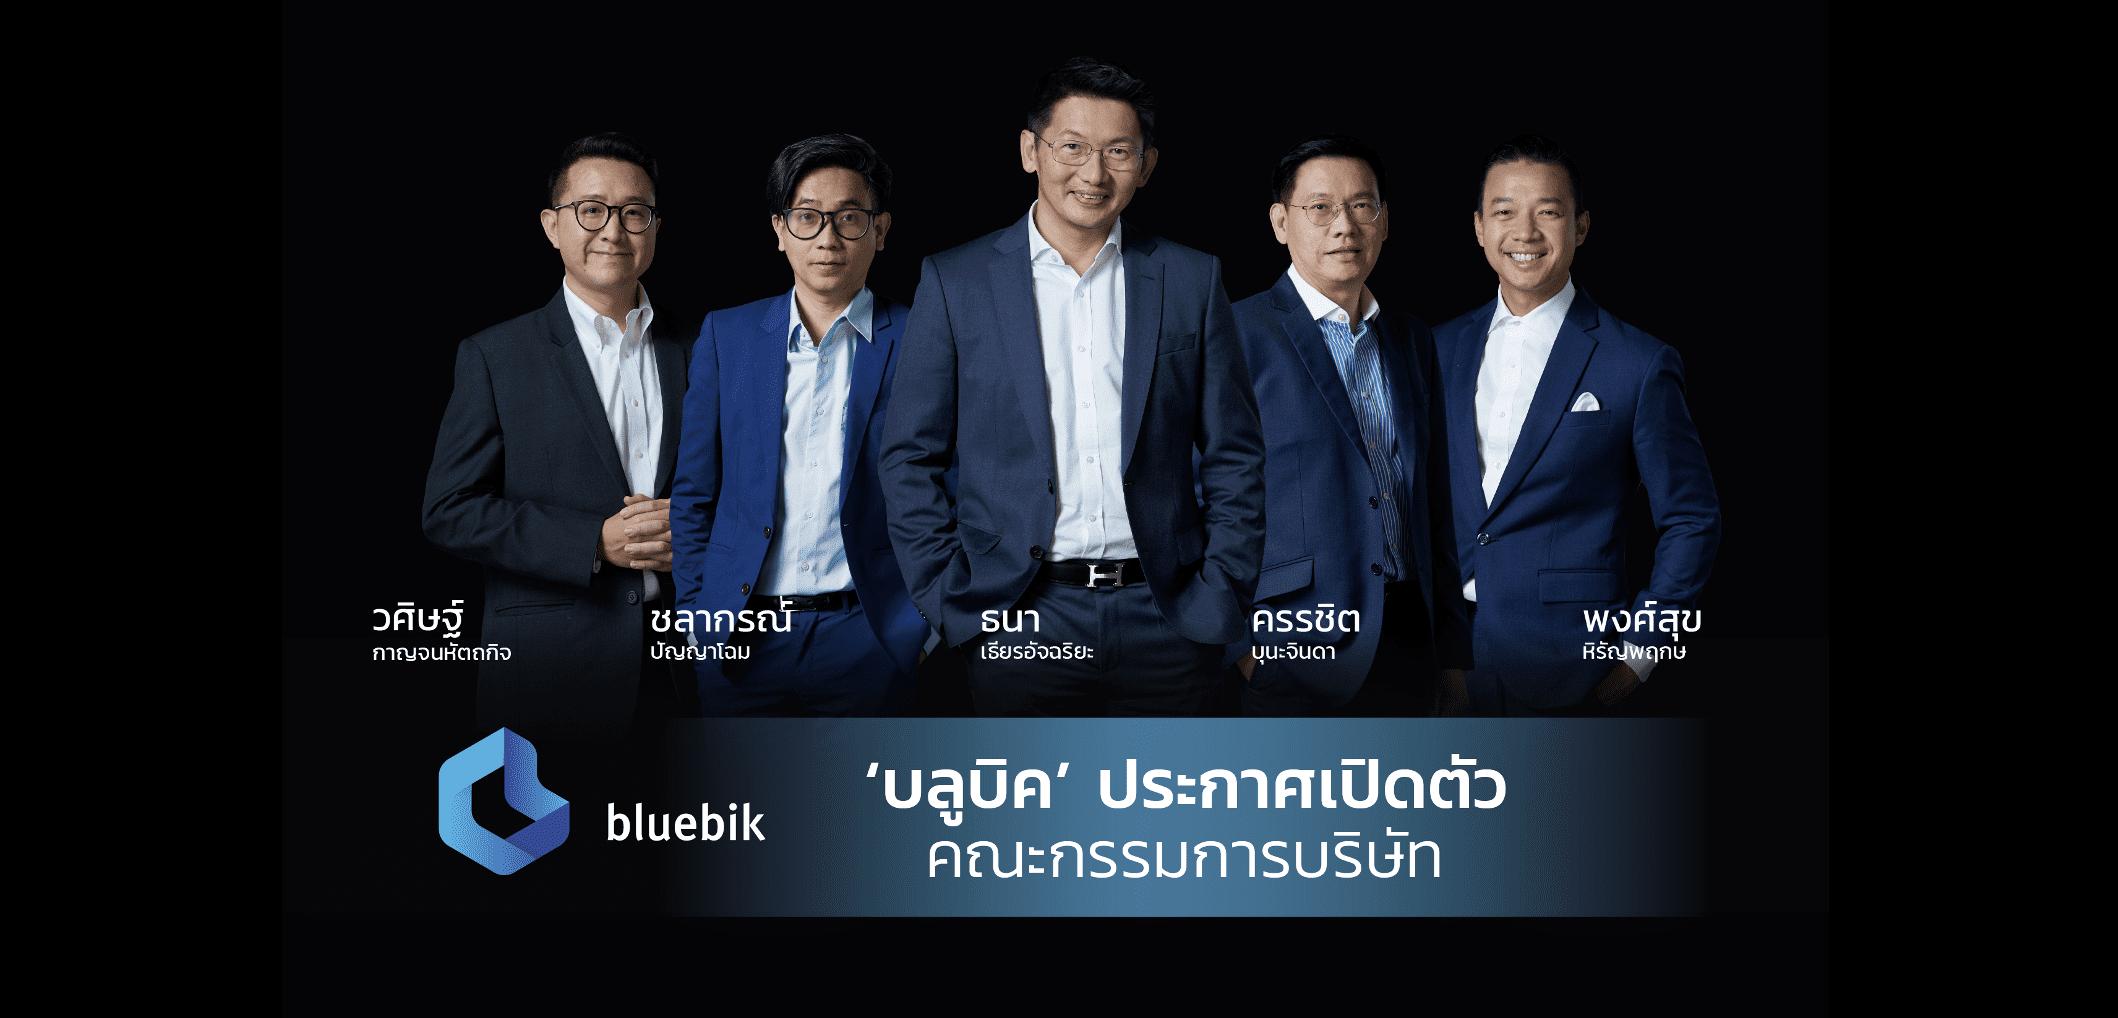 'Bluebik' เปิดตัว 5 คณะกรรมการบริษัทฯ พร้อมเผยกลยุทธ์เอาชนะคู่แข่งระดับโลก